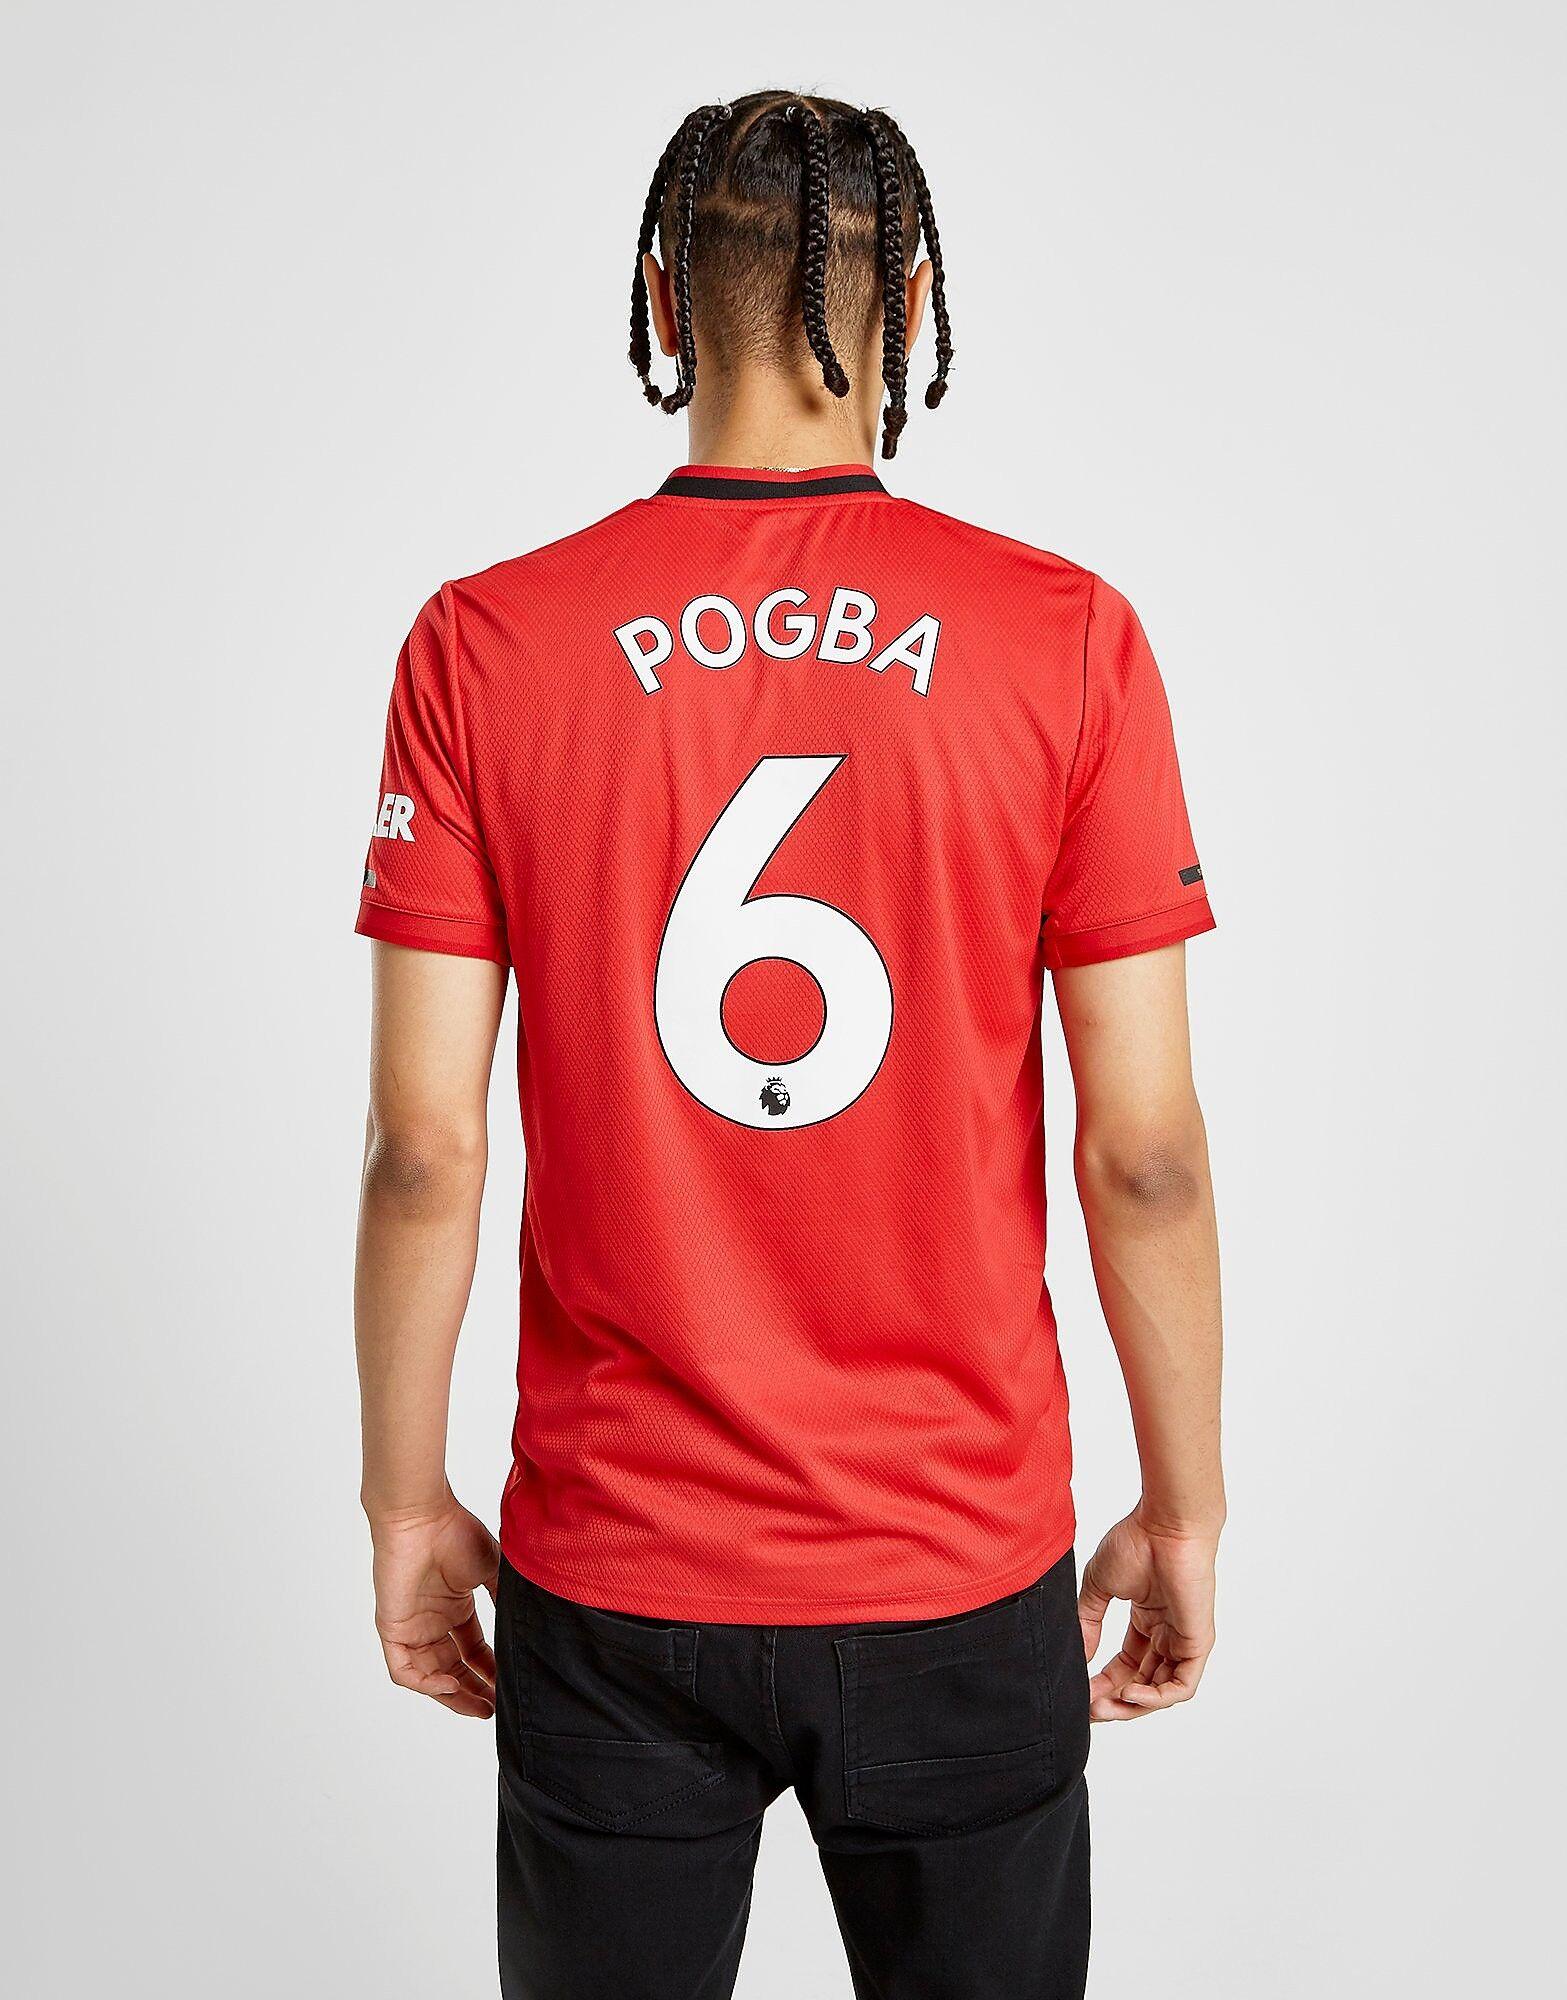 Image of Adidas Manchester United FC 2019/20 Pogba #6 Home Shirt - Mens, Punainen